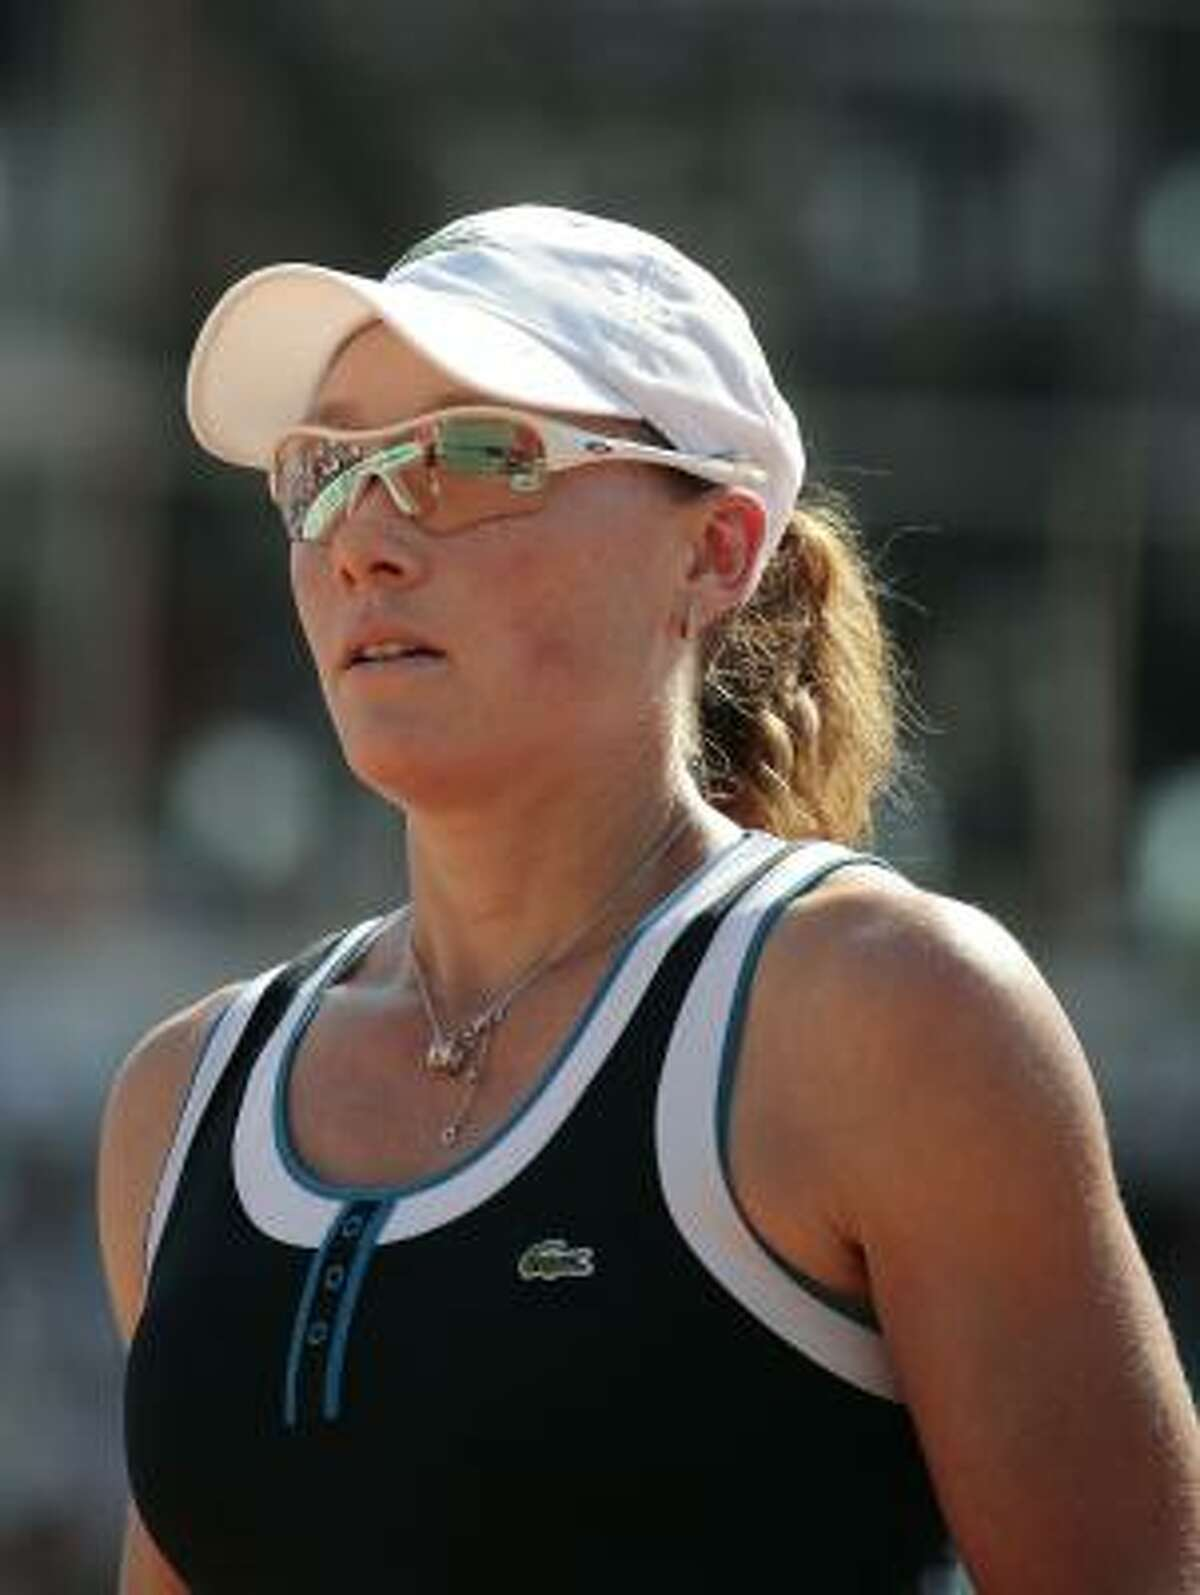 Australia's Samantha Stosur looks on during her women's semifinal match against Serbia's Jelena Jankovic.